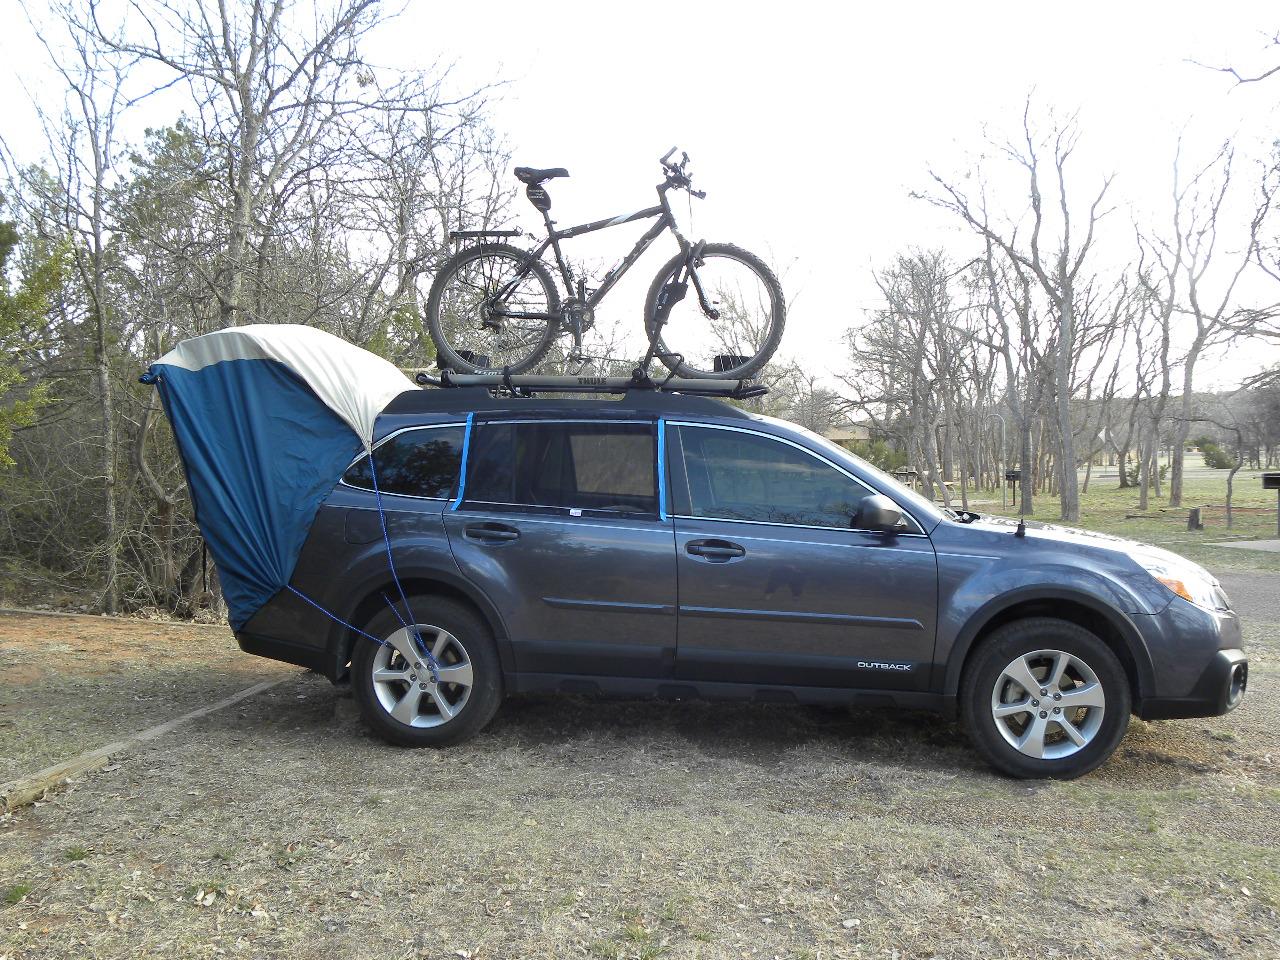 Subaru Outback Camping >> Ultimate Outback car camping thread - Page 24 - Subaru Outback - Subaru Outback Forums